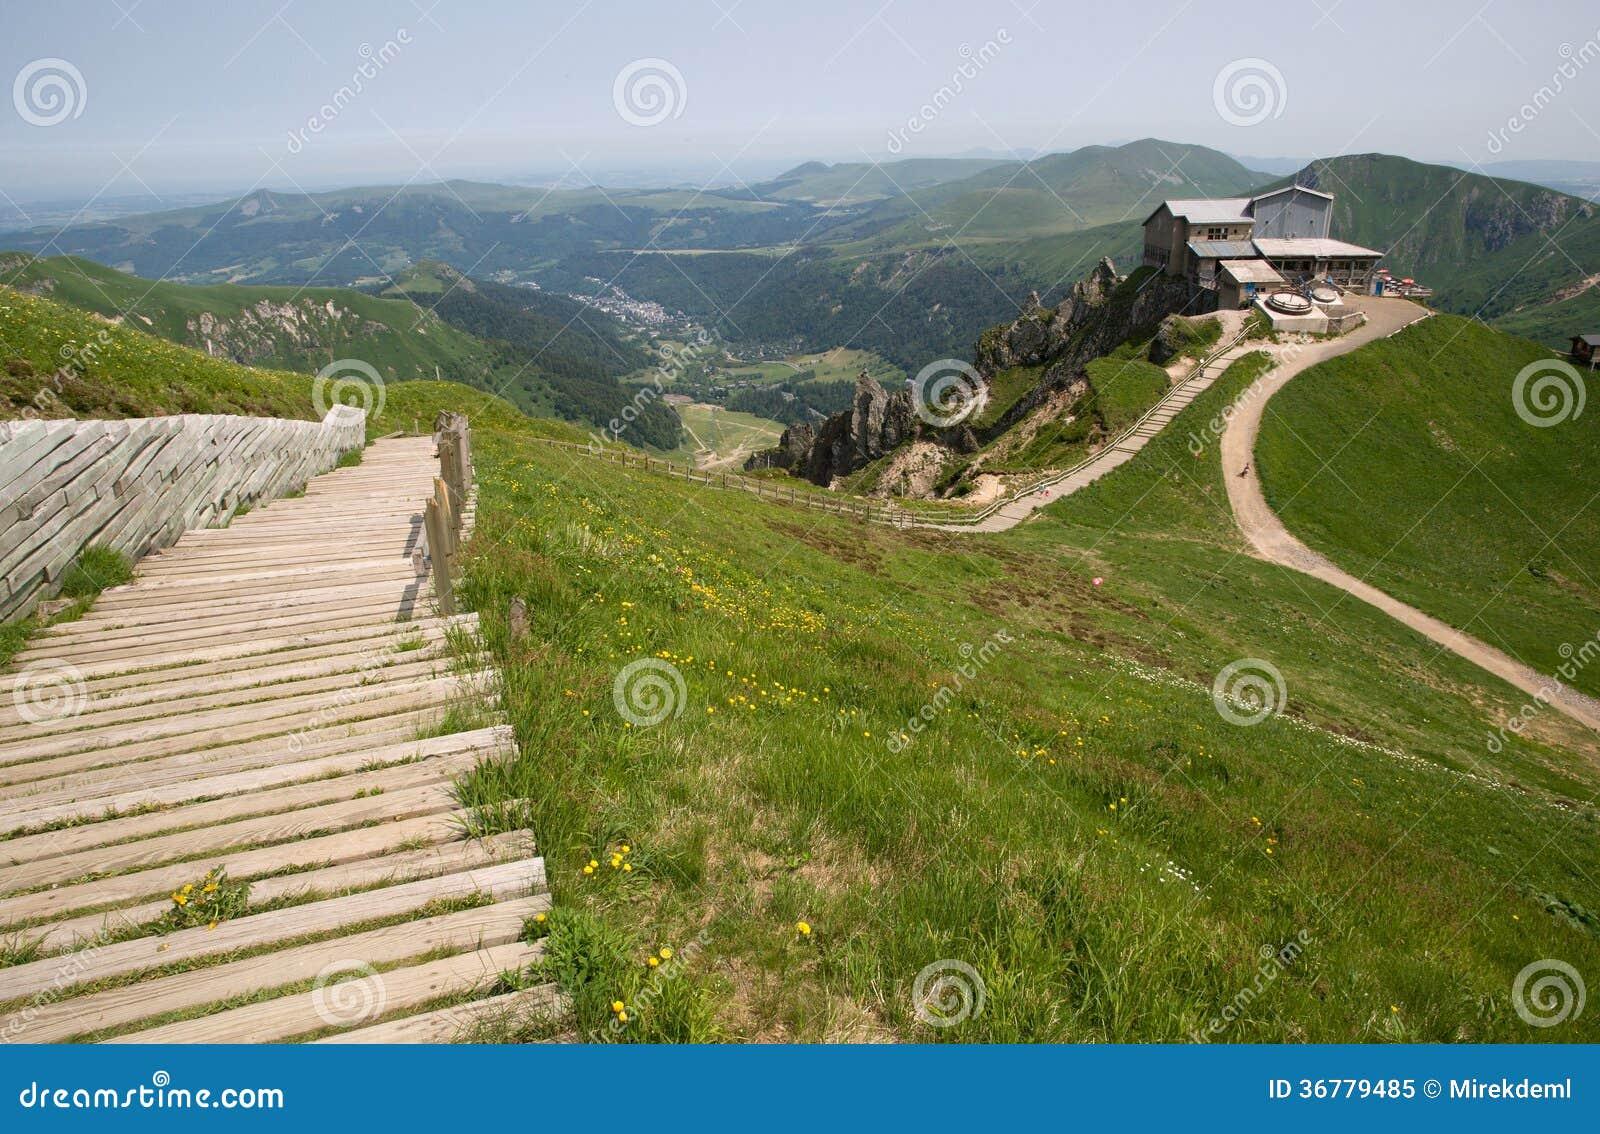 puy de sancy france stock image image of hiking beautiful 36779485. Black Bedroom Furniture Sets. Home Design Ideas